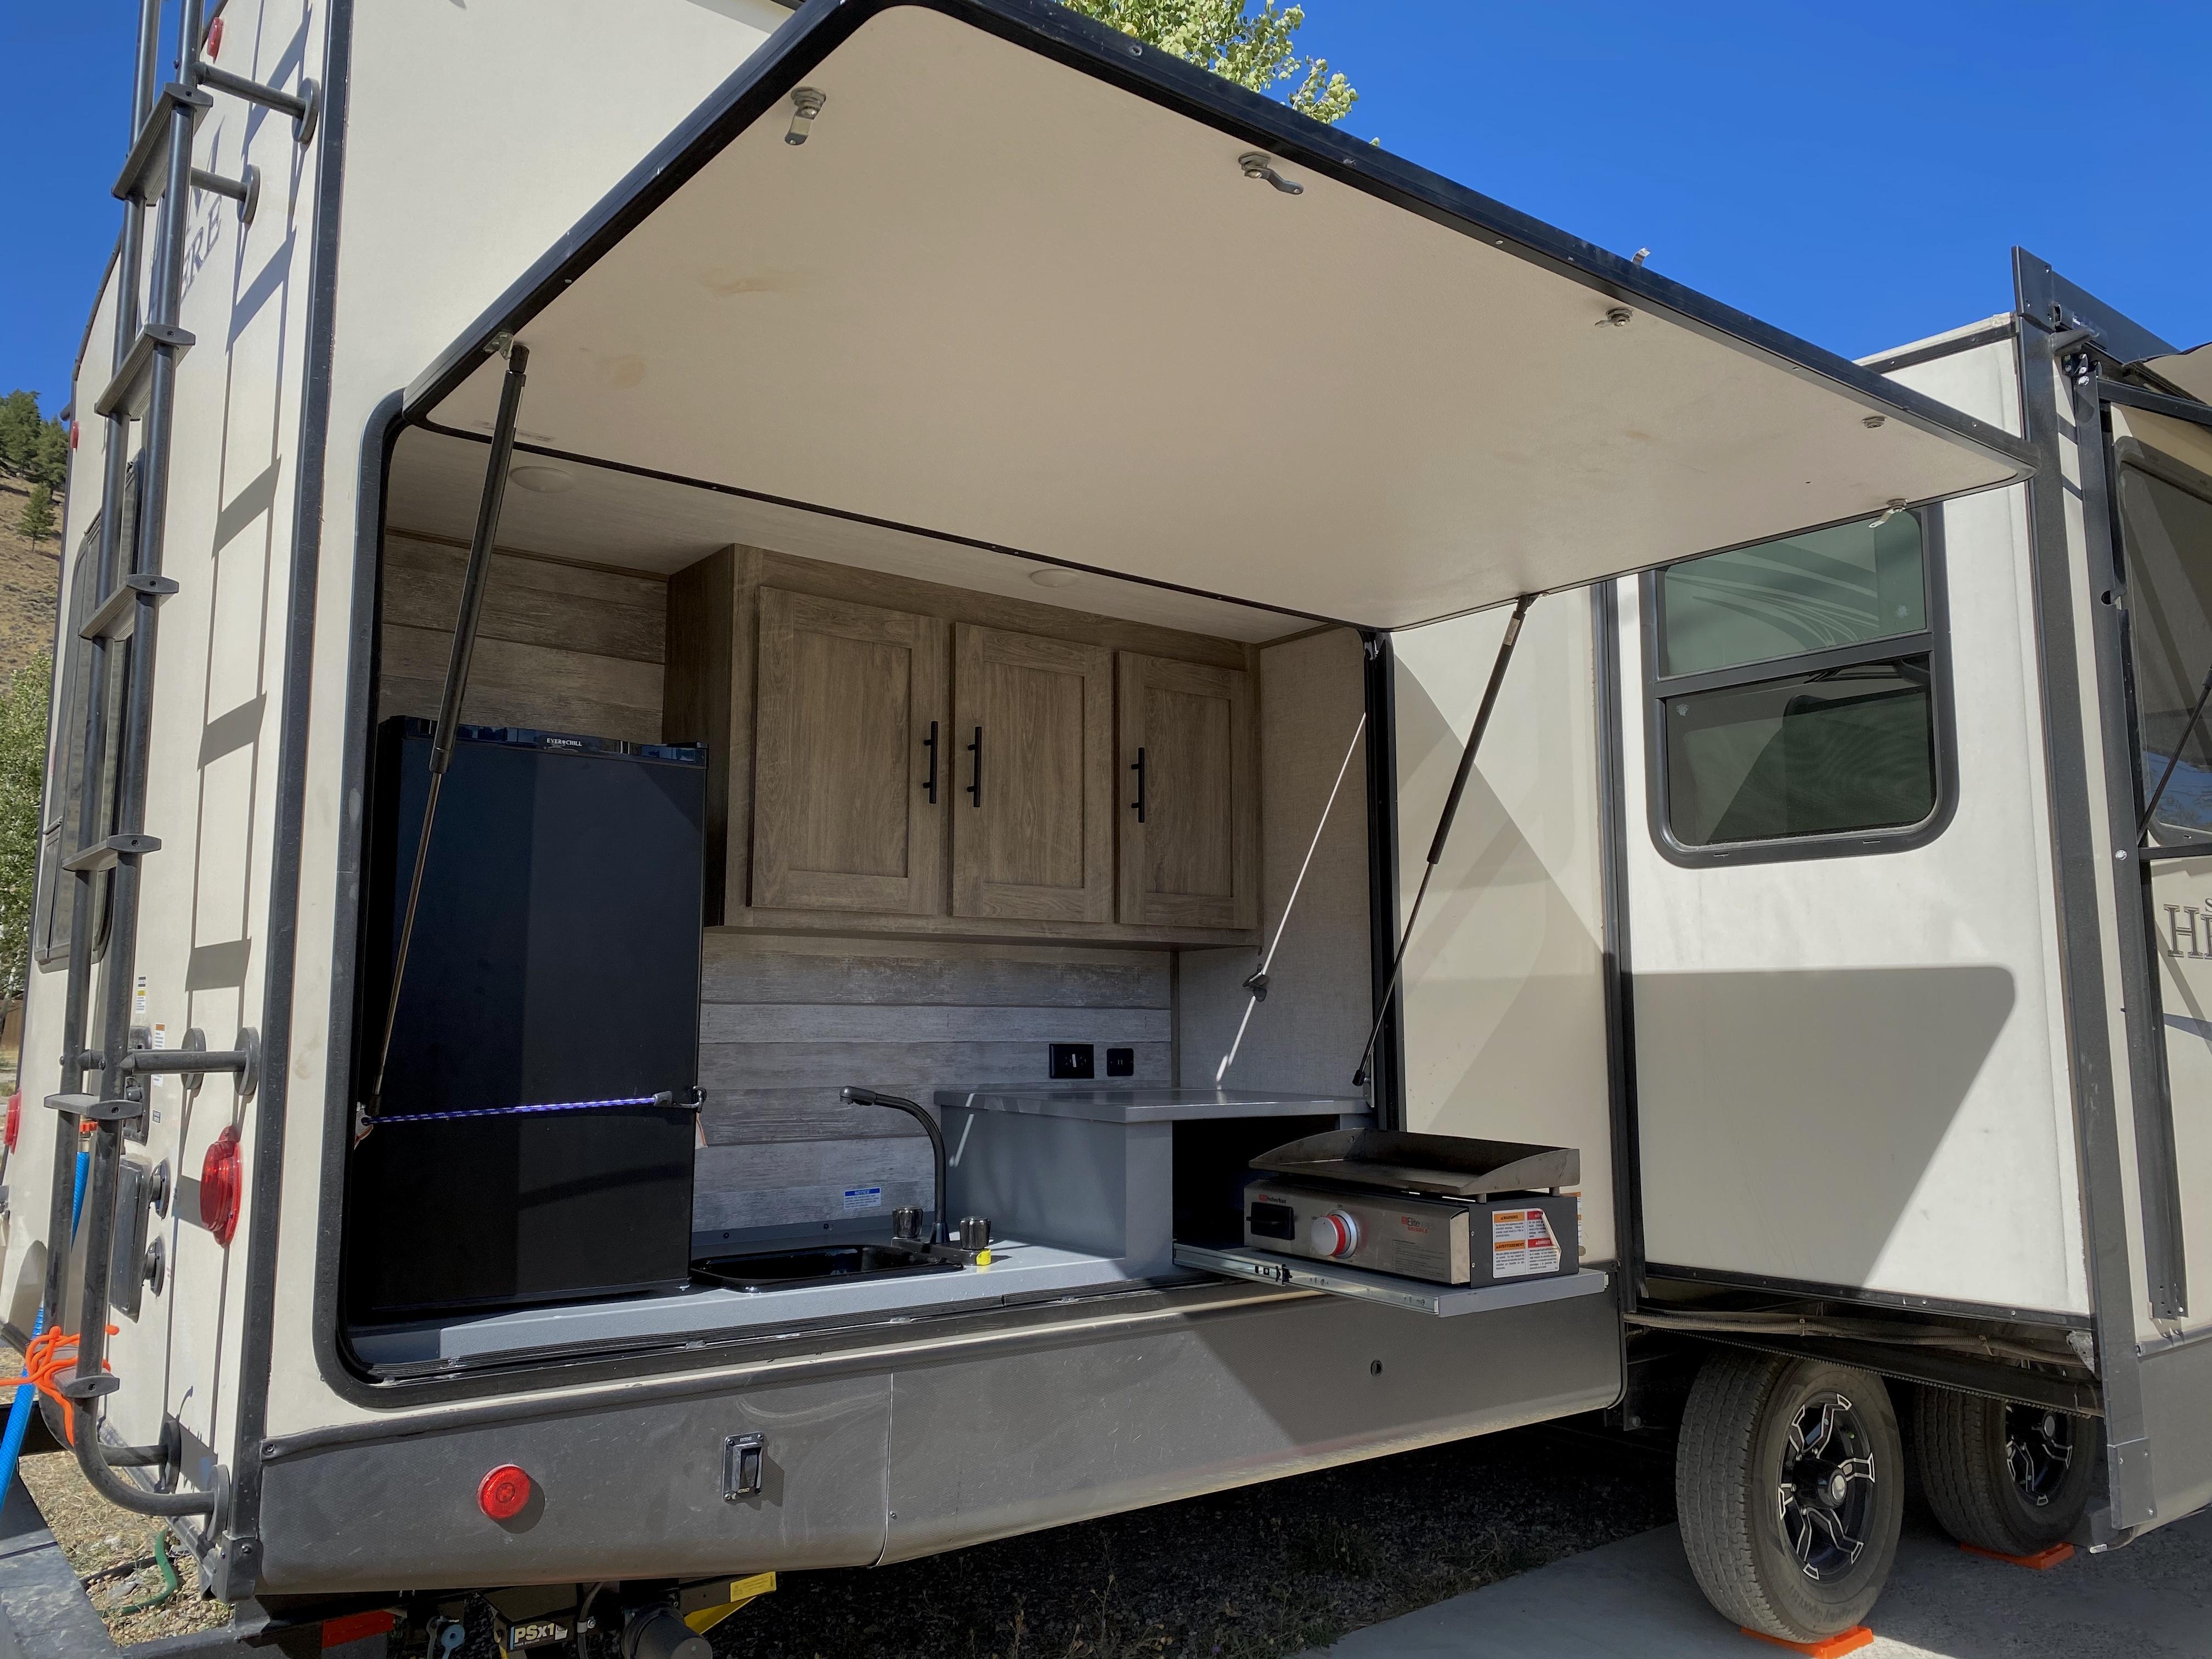 Full outdoor kitchen!. Forest River Salem Hemisphere 2020